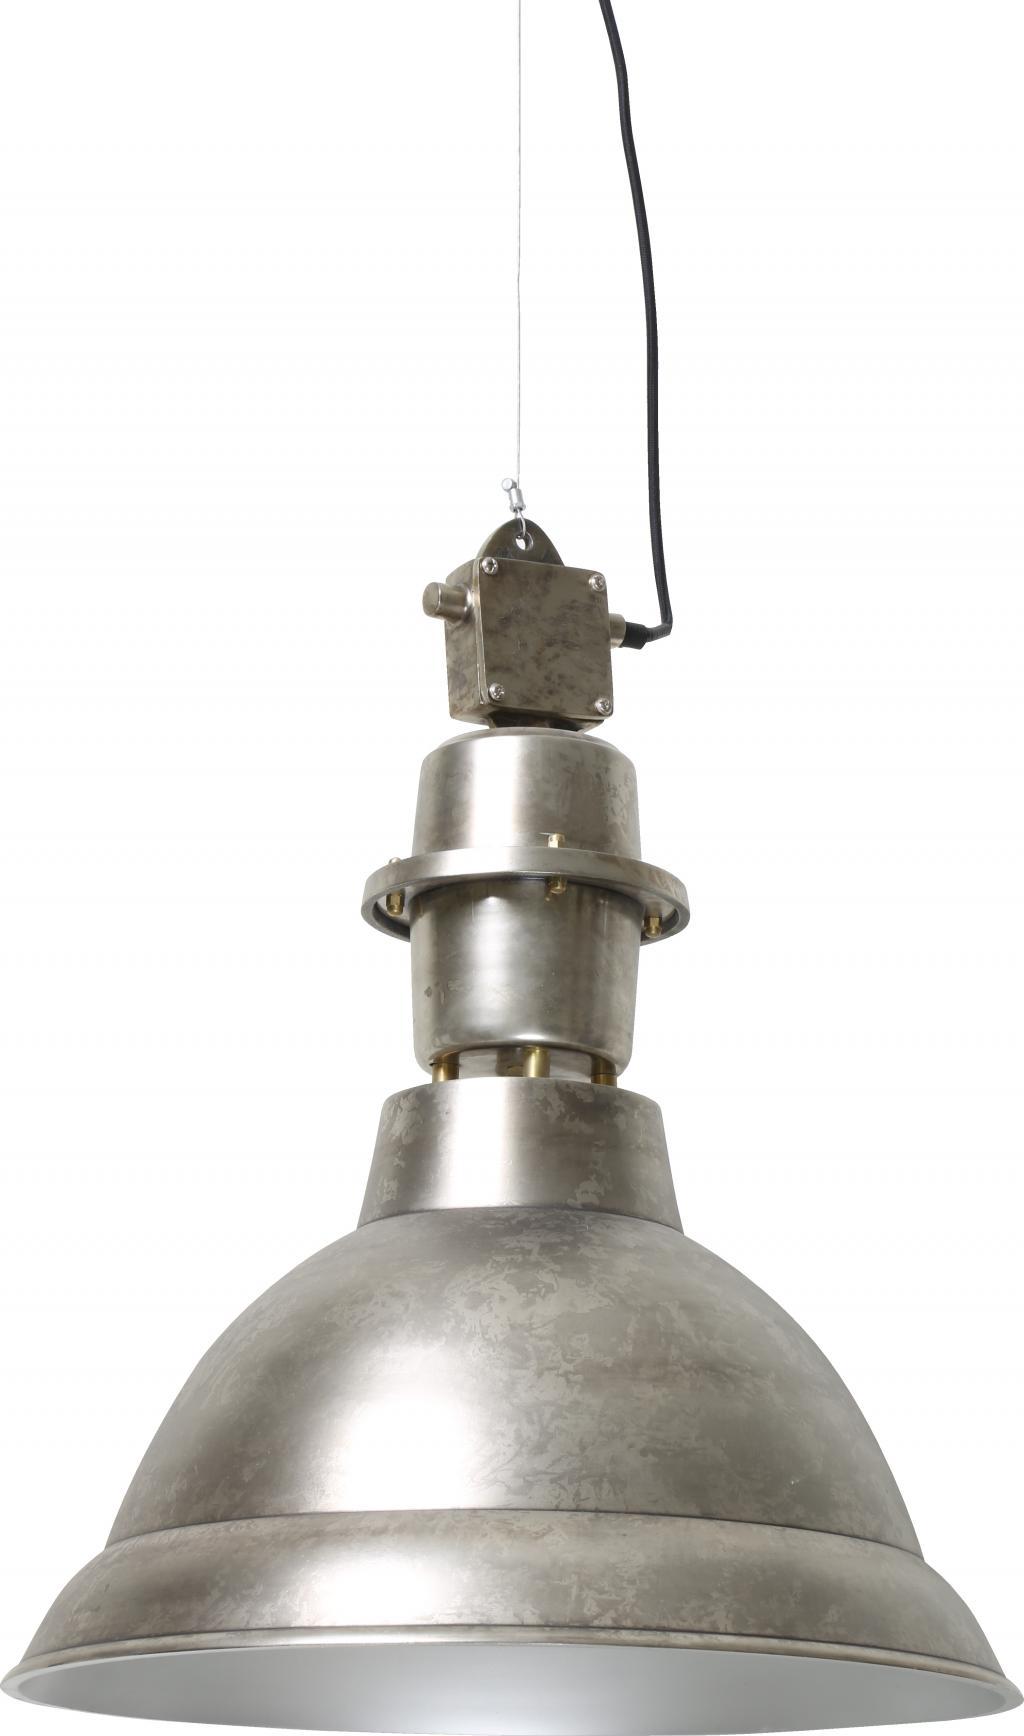 hanglamp-lincoln---antiek-zilver---yo47xh61-cm---light-and-living[1].jpg